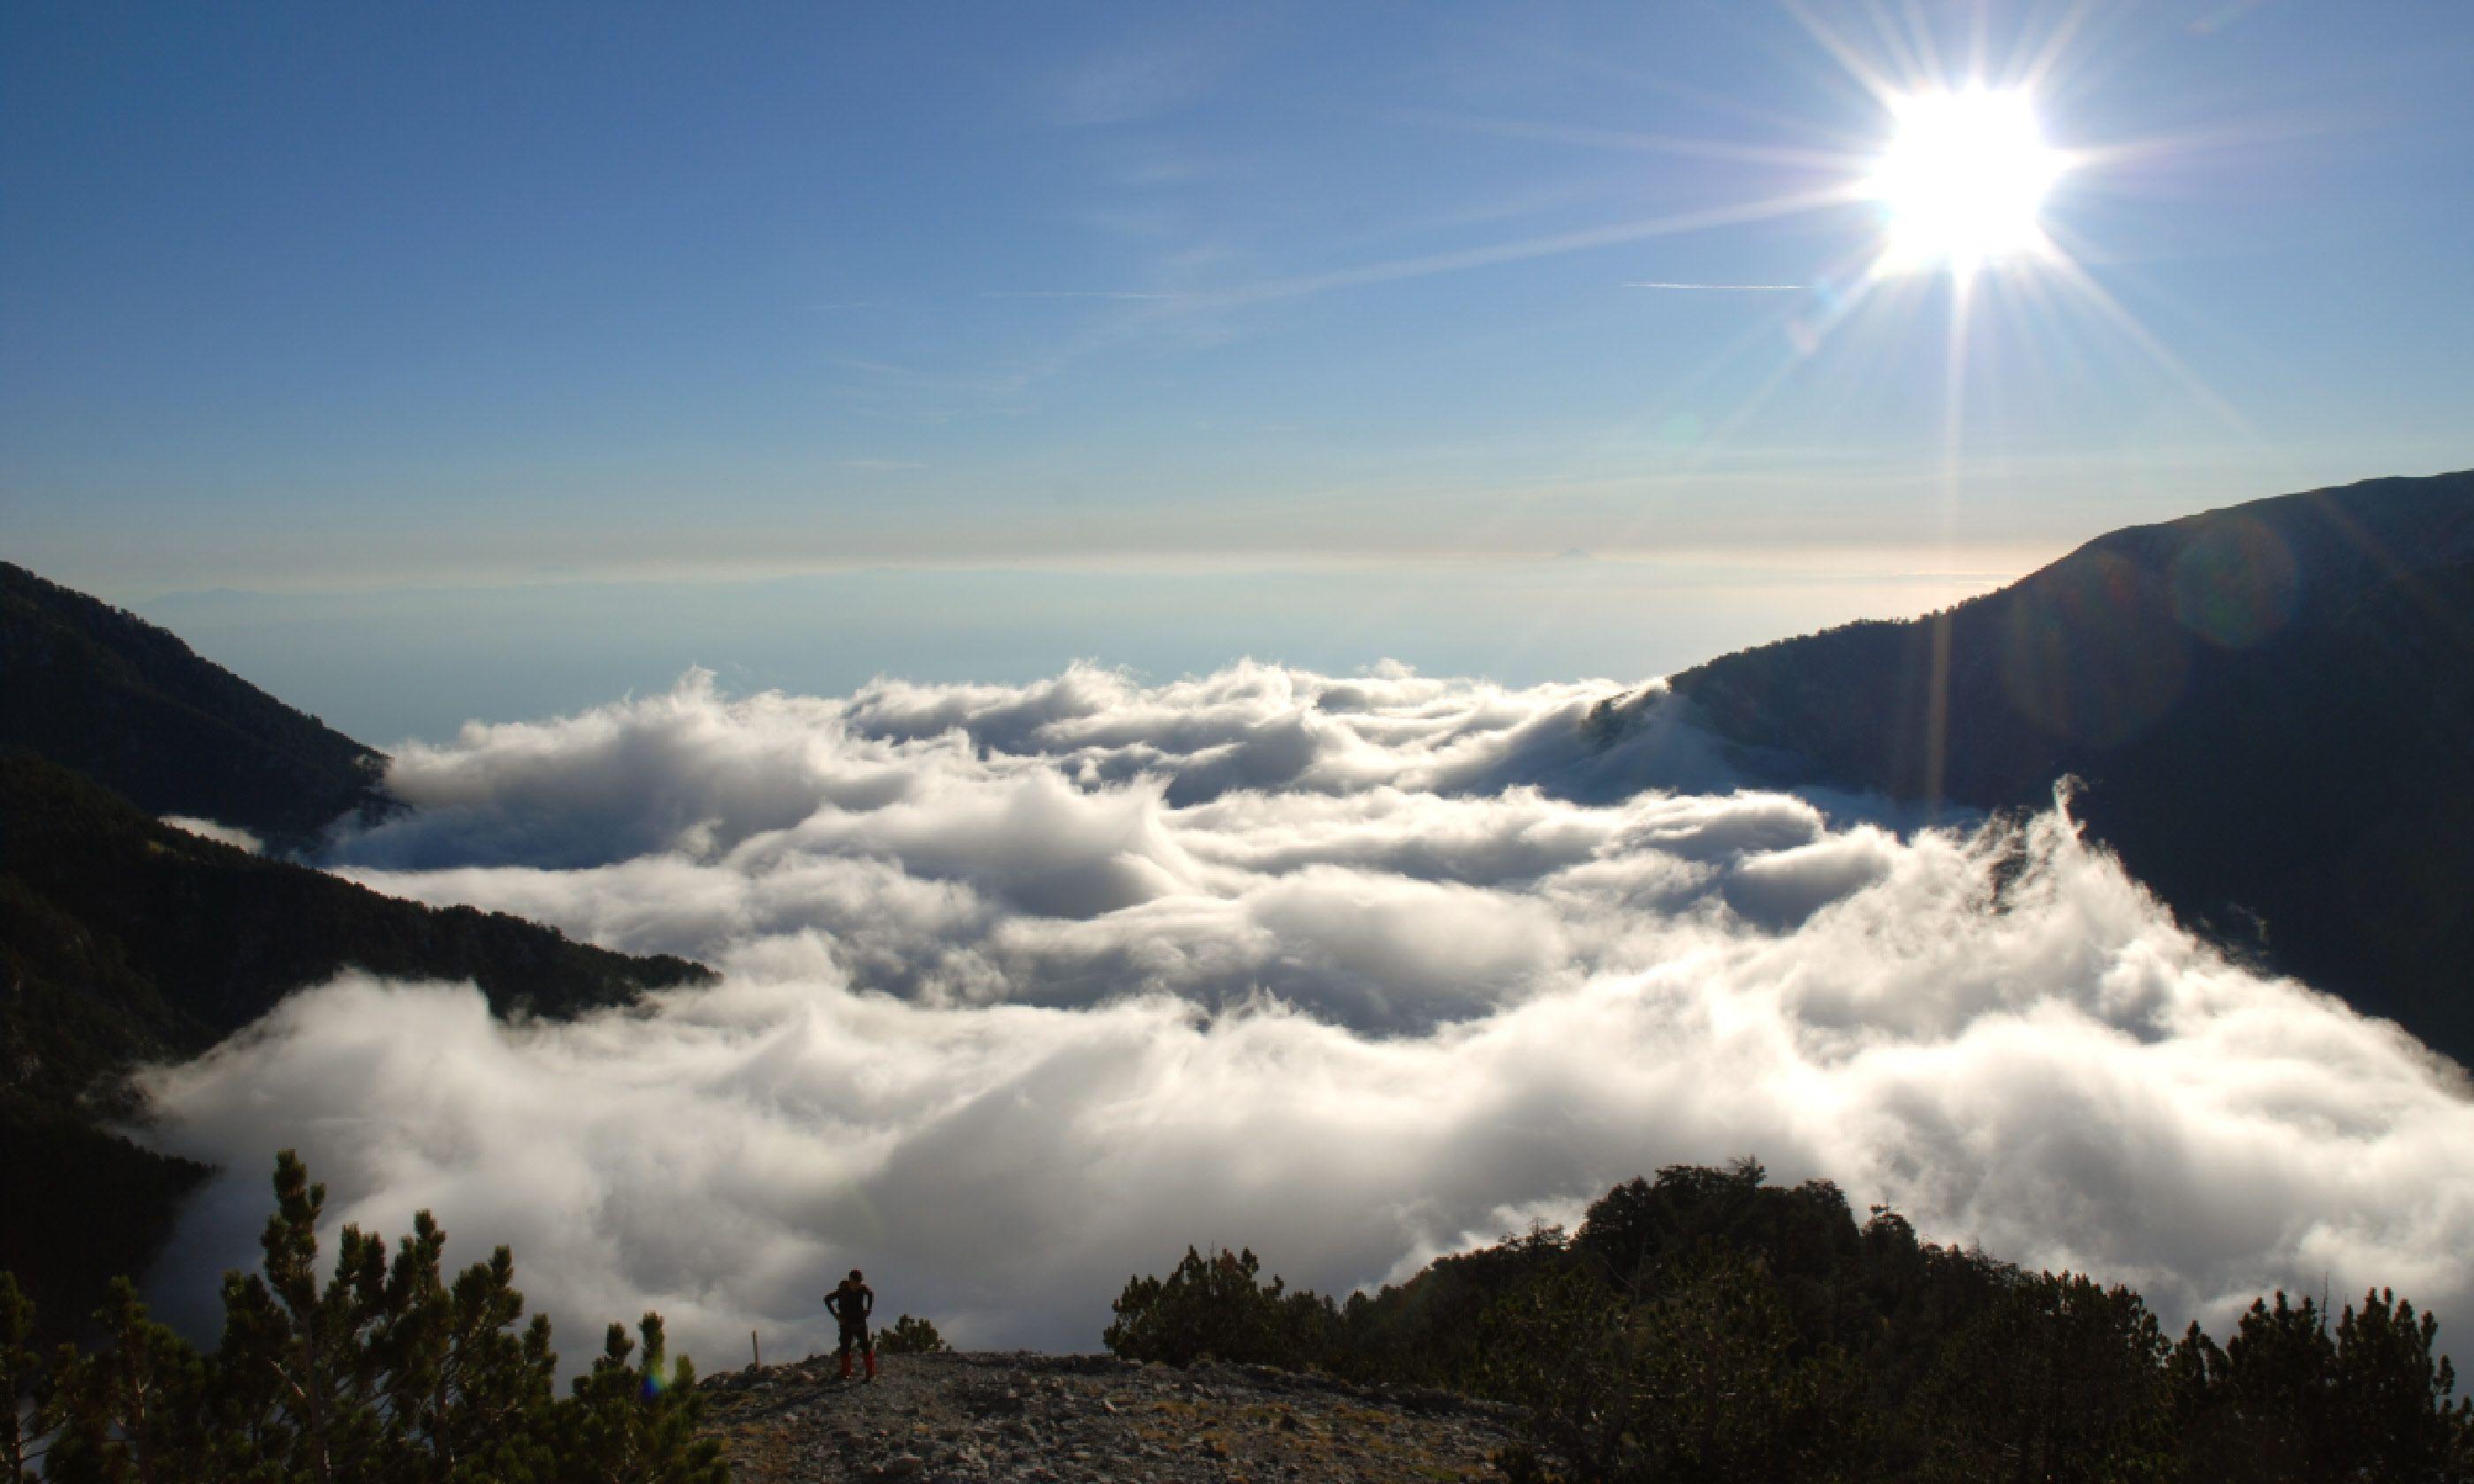 Mount Olympus (Shutterstock)